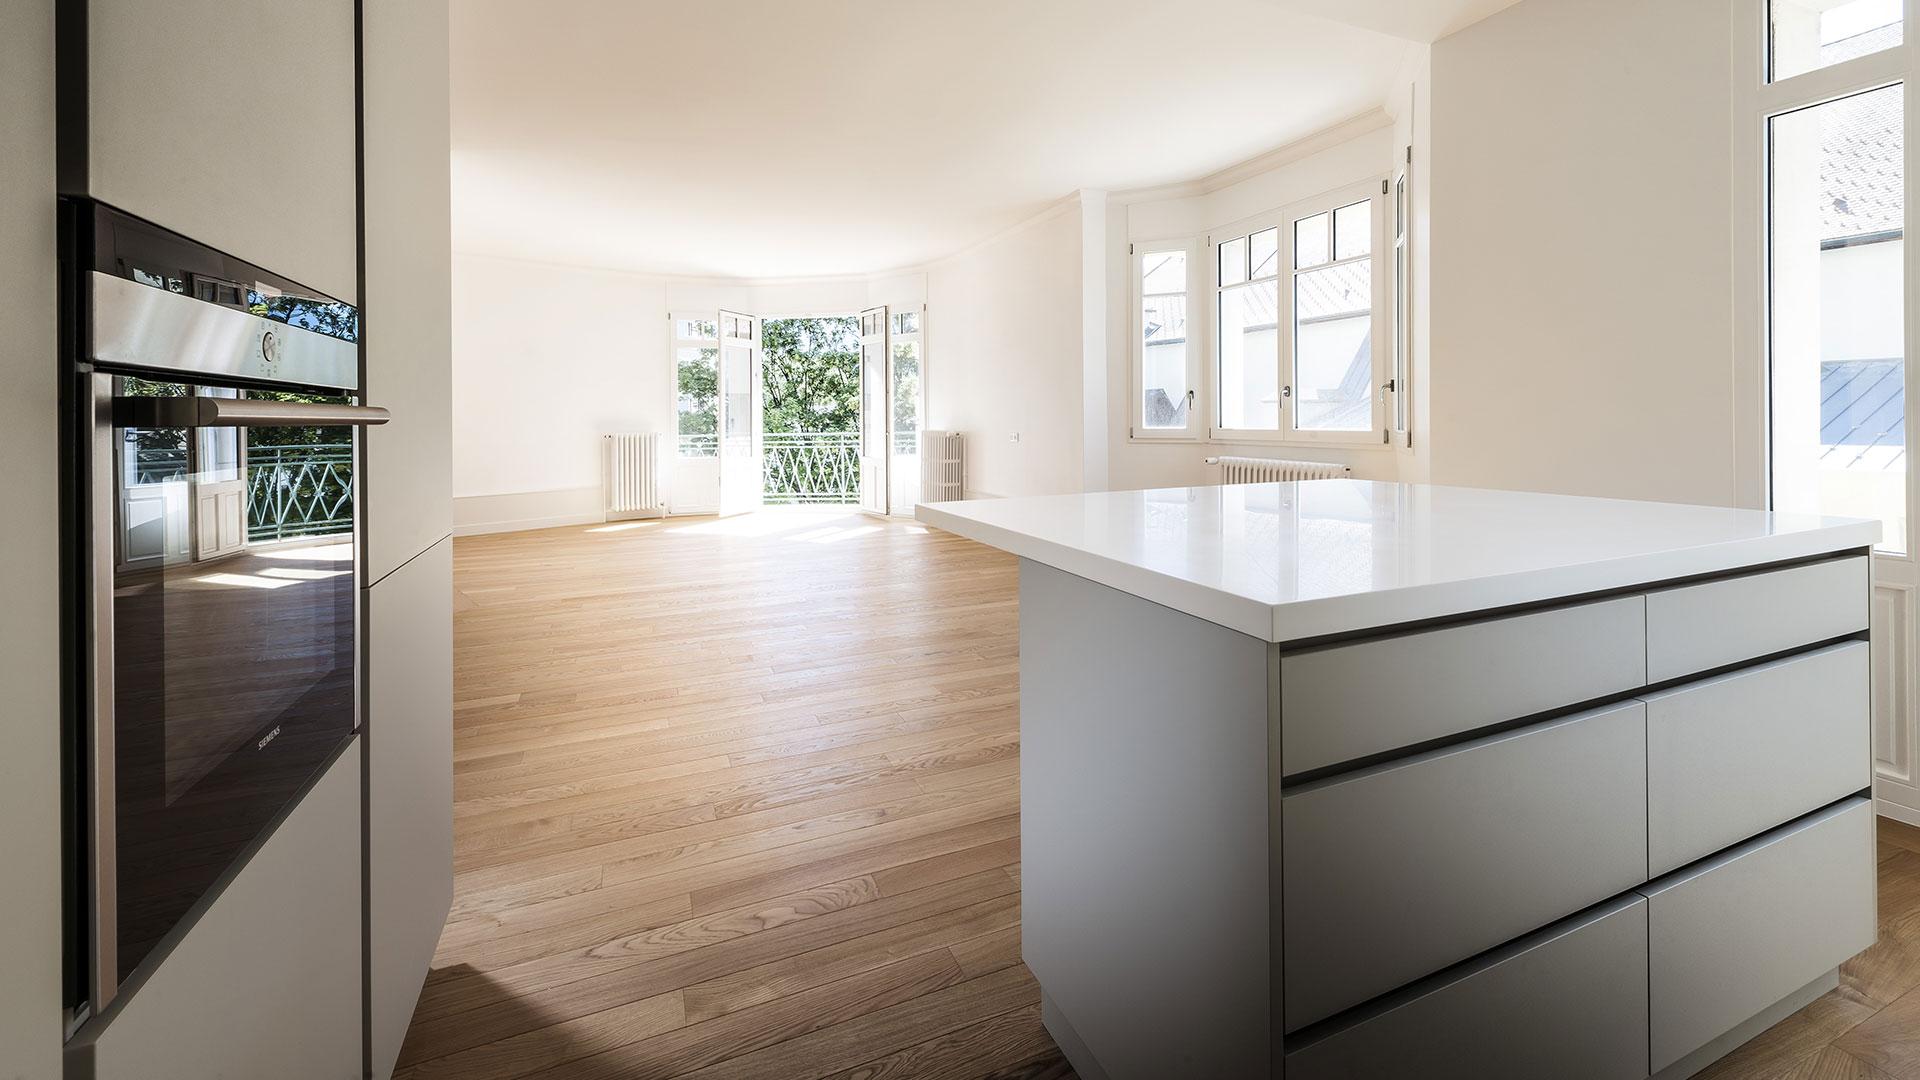 acheter maison annecy centre ville ventana blog. Black Bedroom Furniture Sets. Home Design Ideas